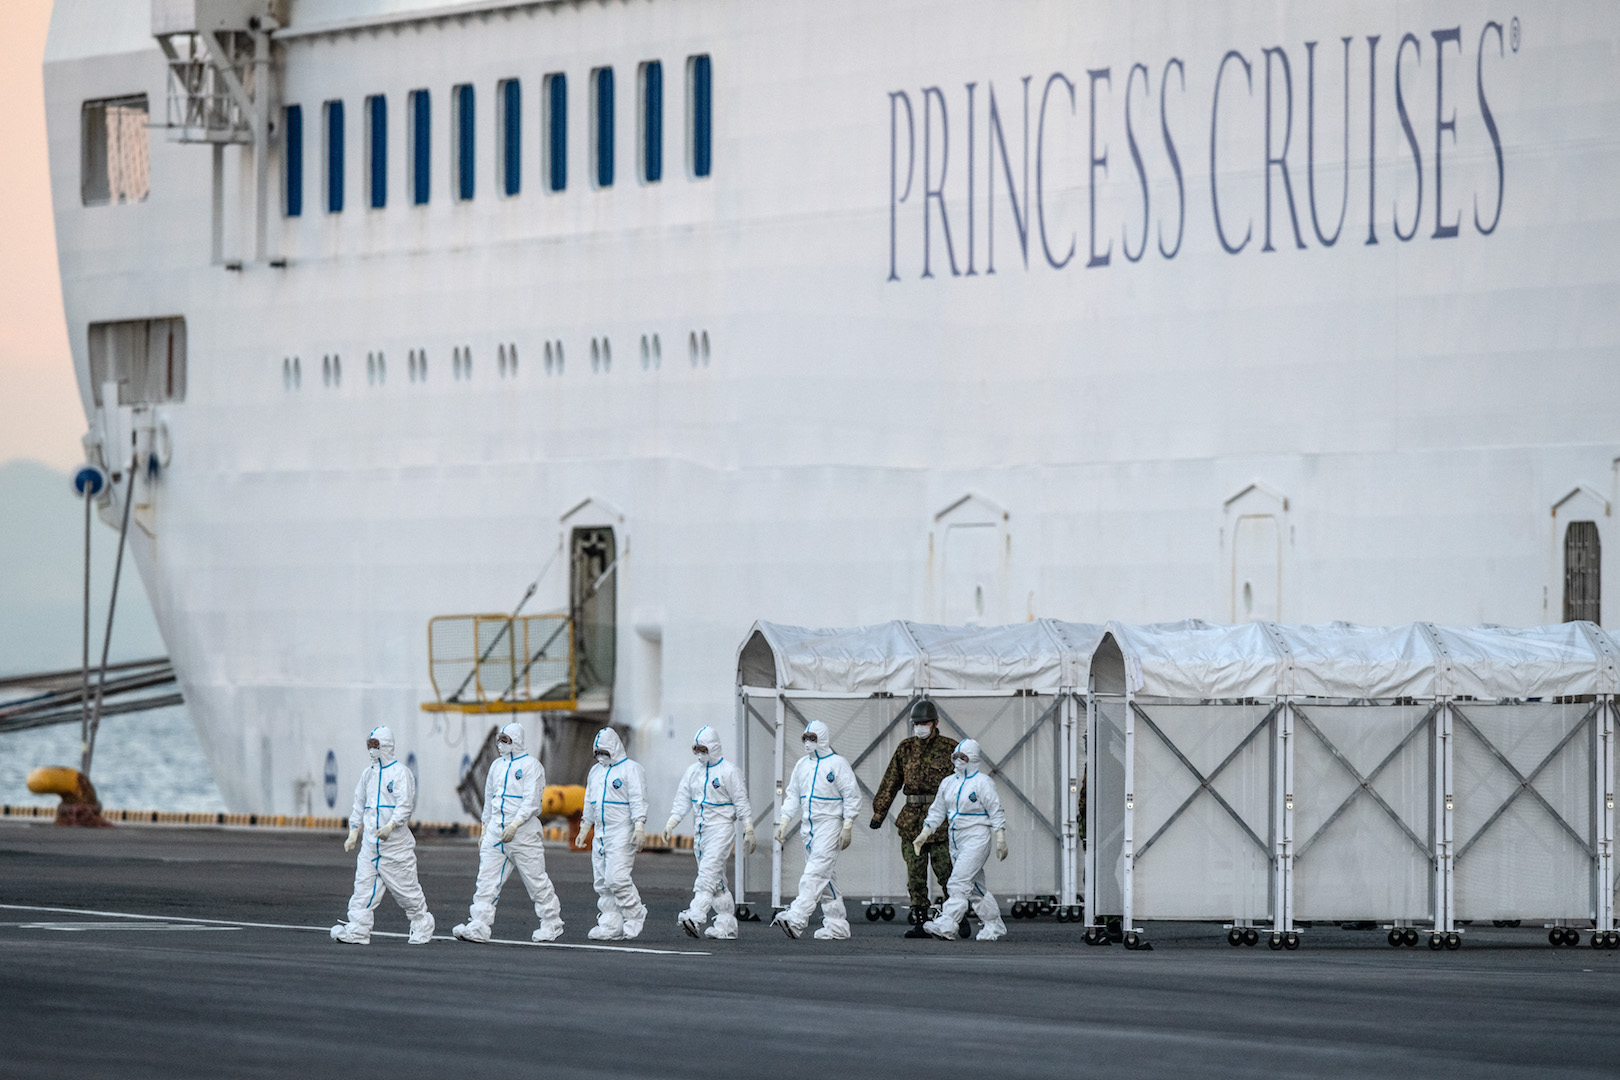 Coronavirus cruise ship nightmare: Are quarantines the right ...